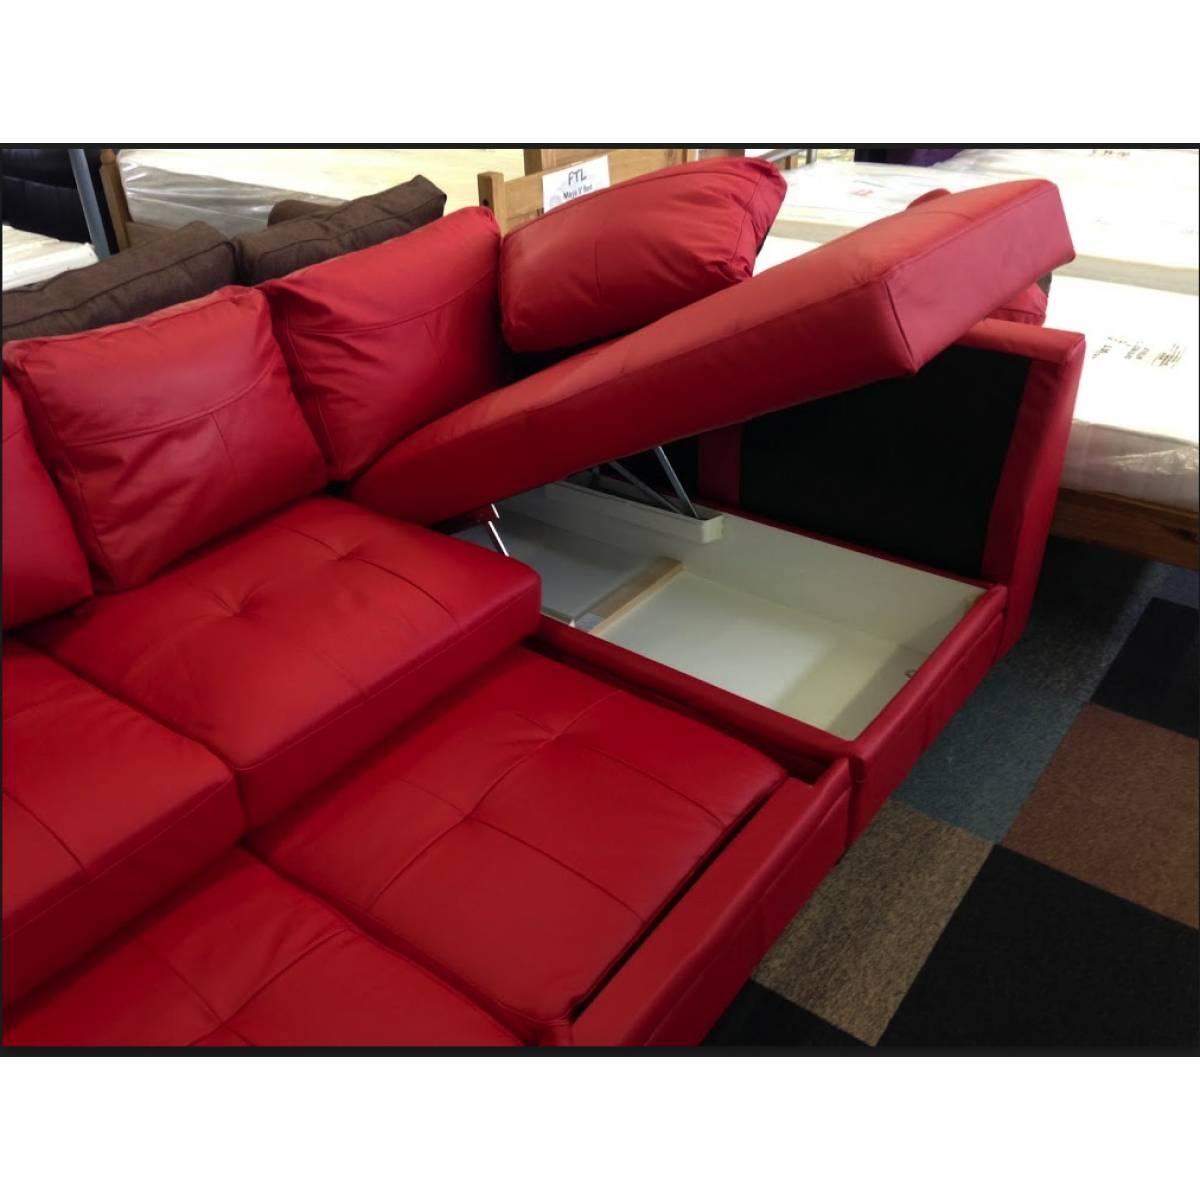 Beautiful Corner Sofa Bed Red Maxresdefault Sofa | Ciov intended for 2X2 Corner Sofas (Image 1 of 30)